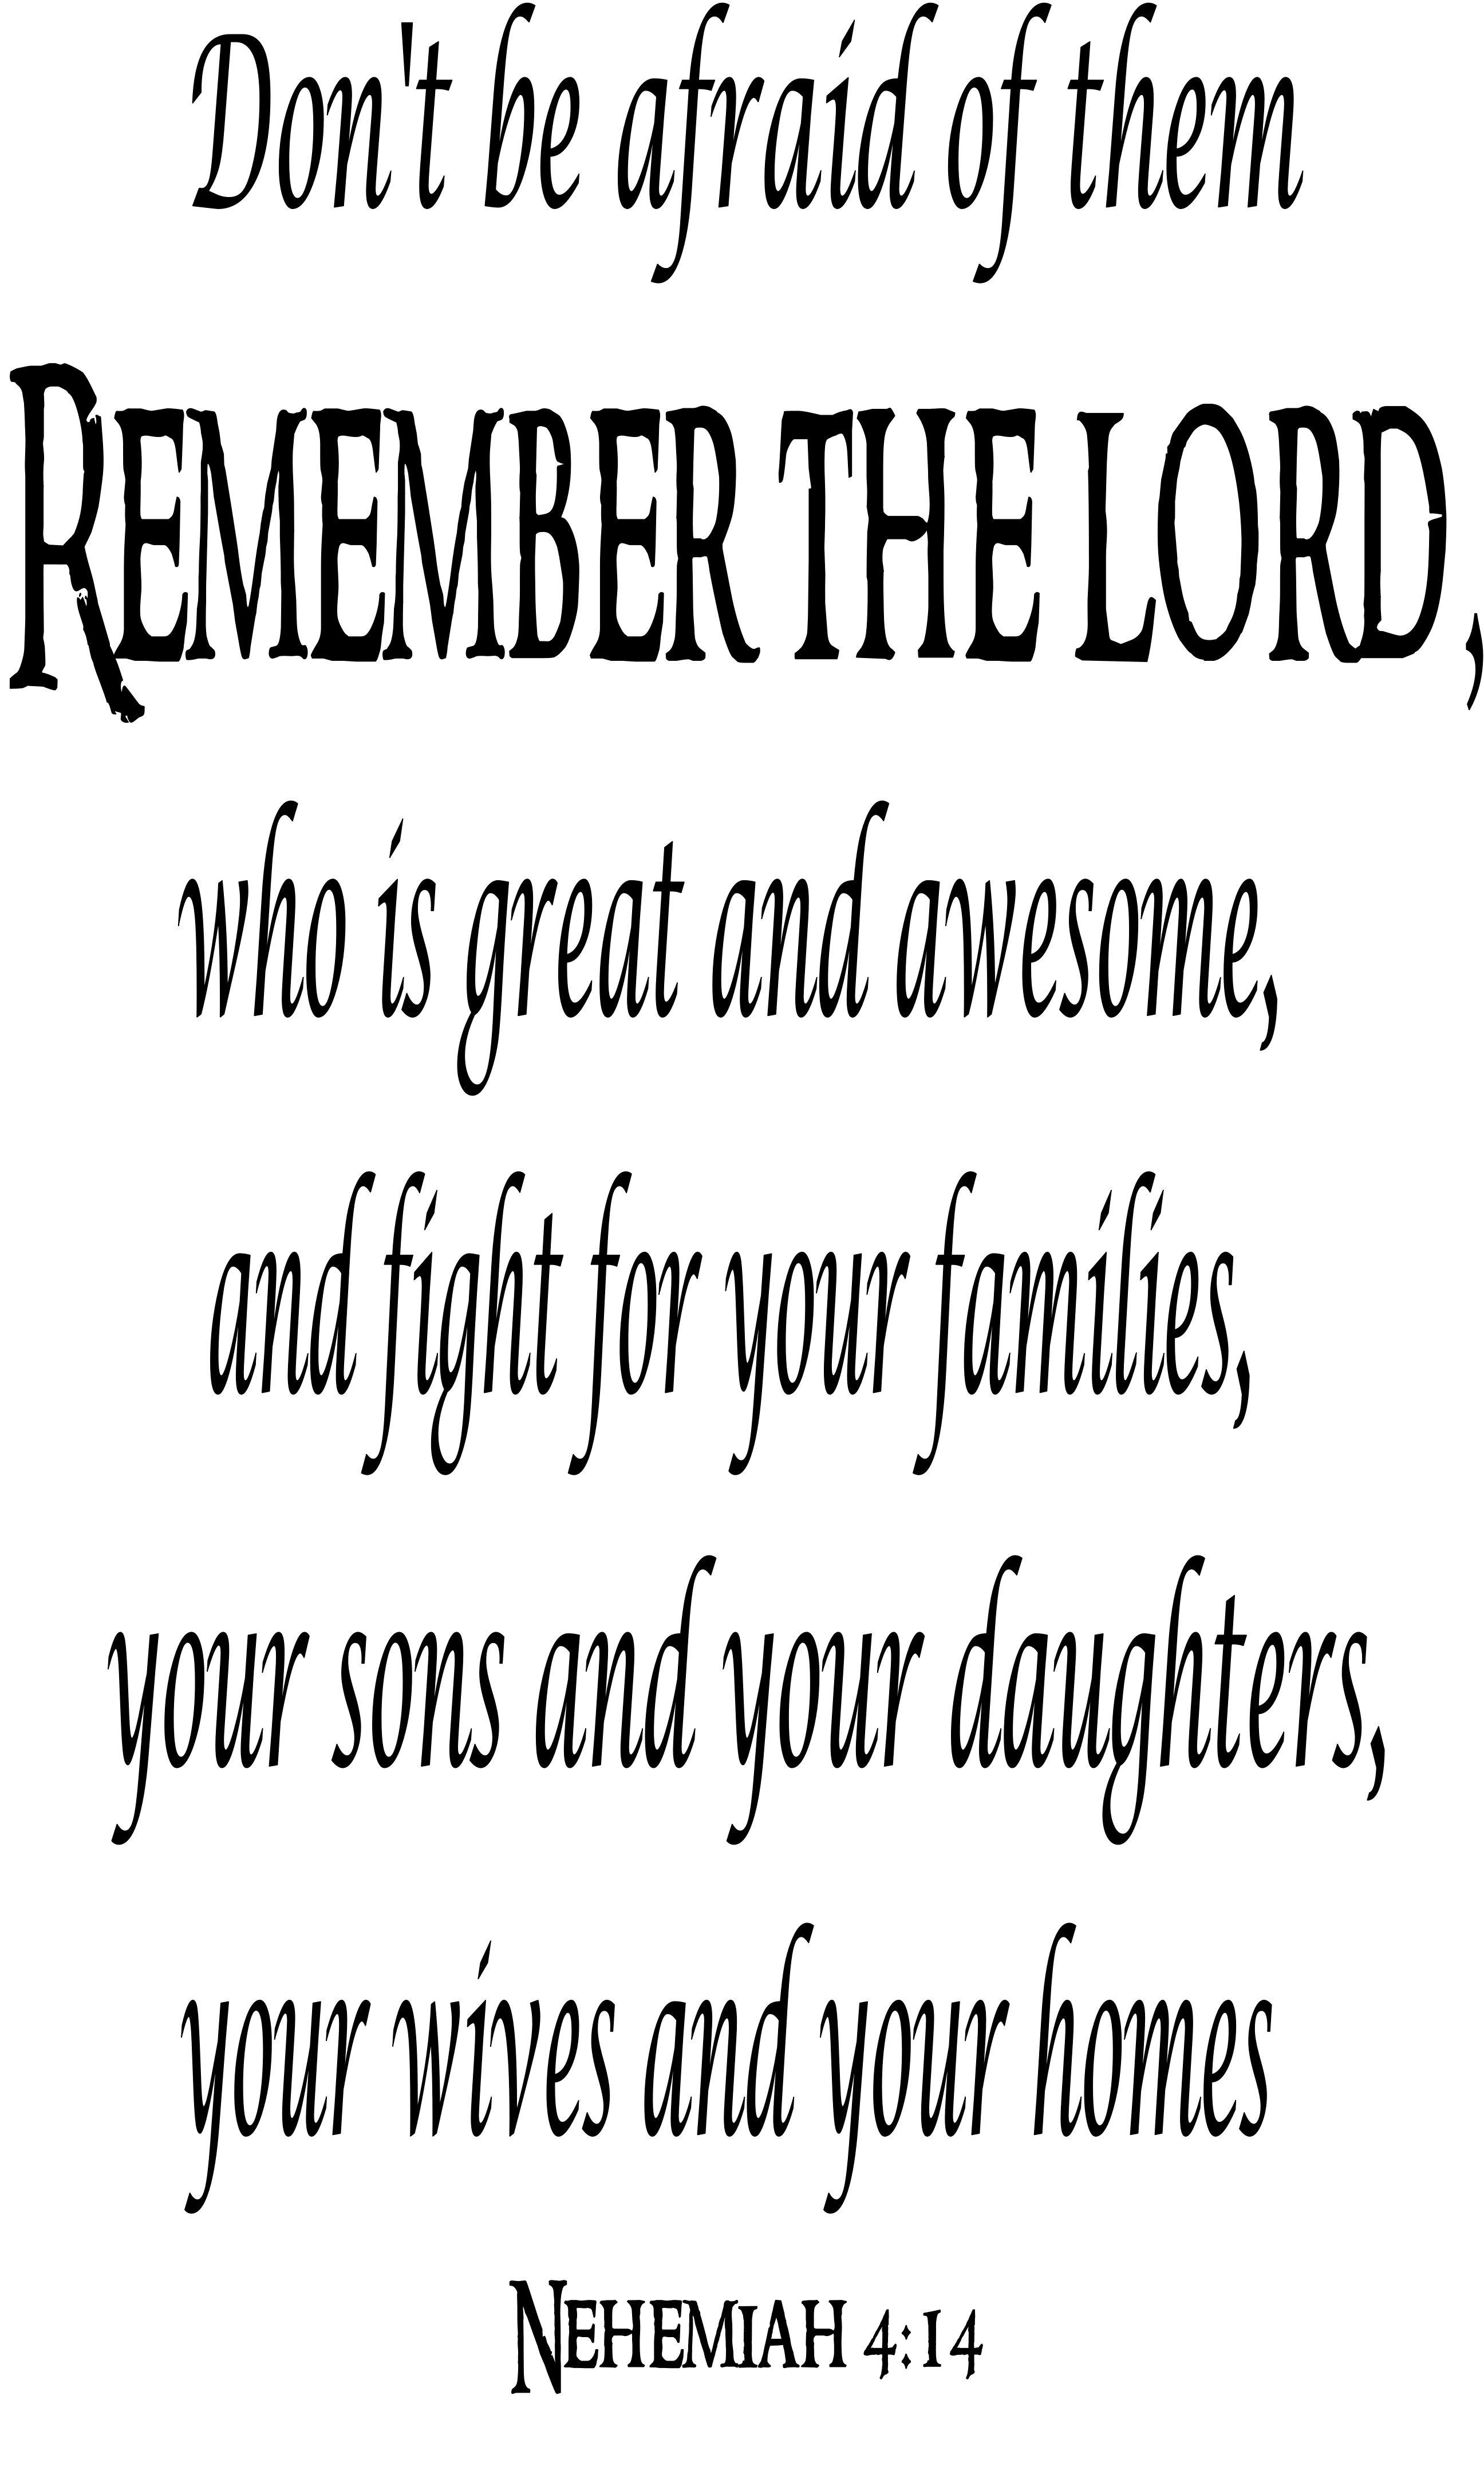 Nehemiah 4:14 Giant Size 3